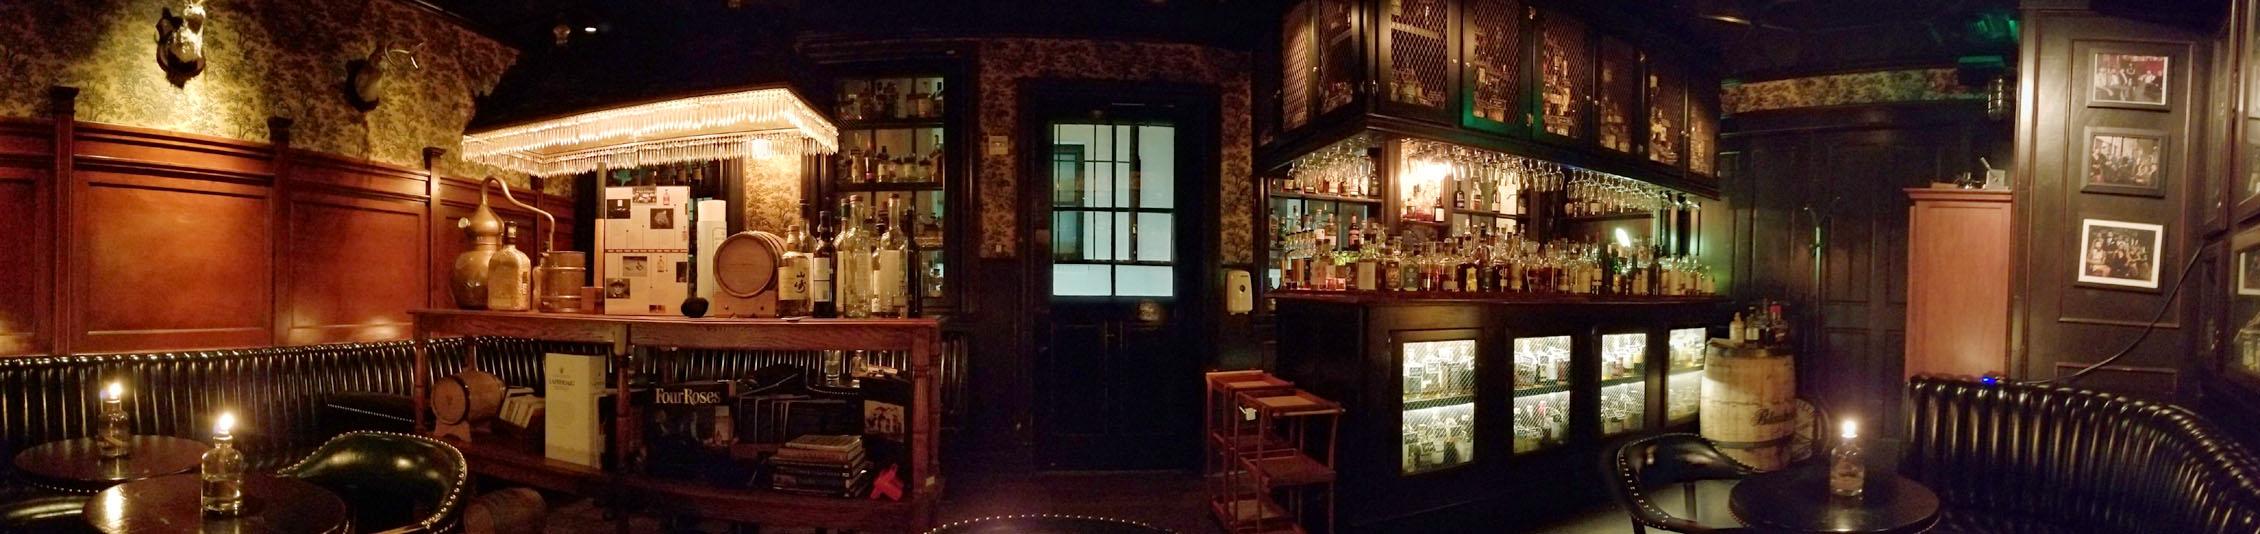 Bar Jackalope Interior